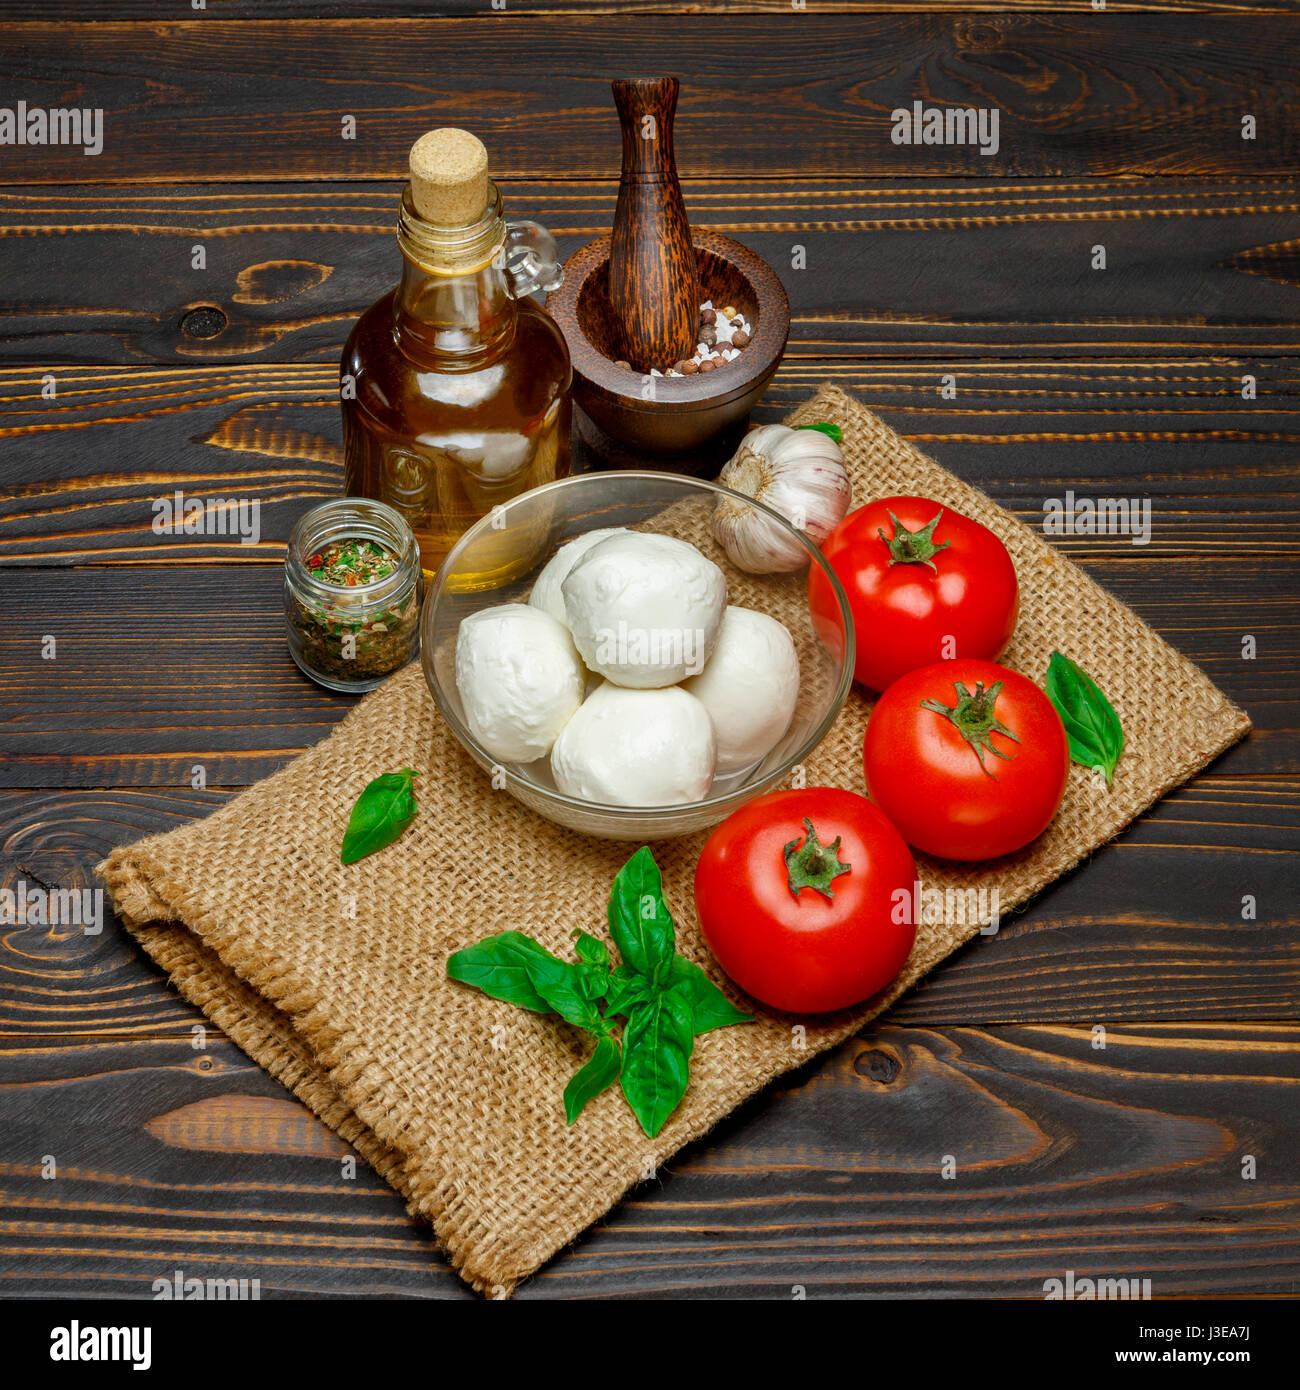 Caprese Salat Zutaten - Mozzarella und Tomaten Stockfoto